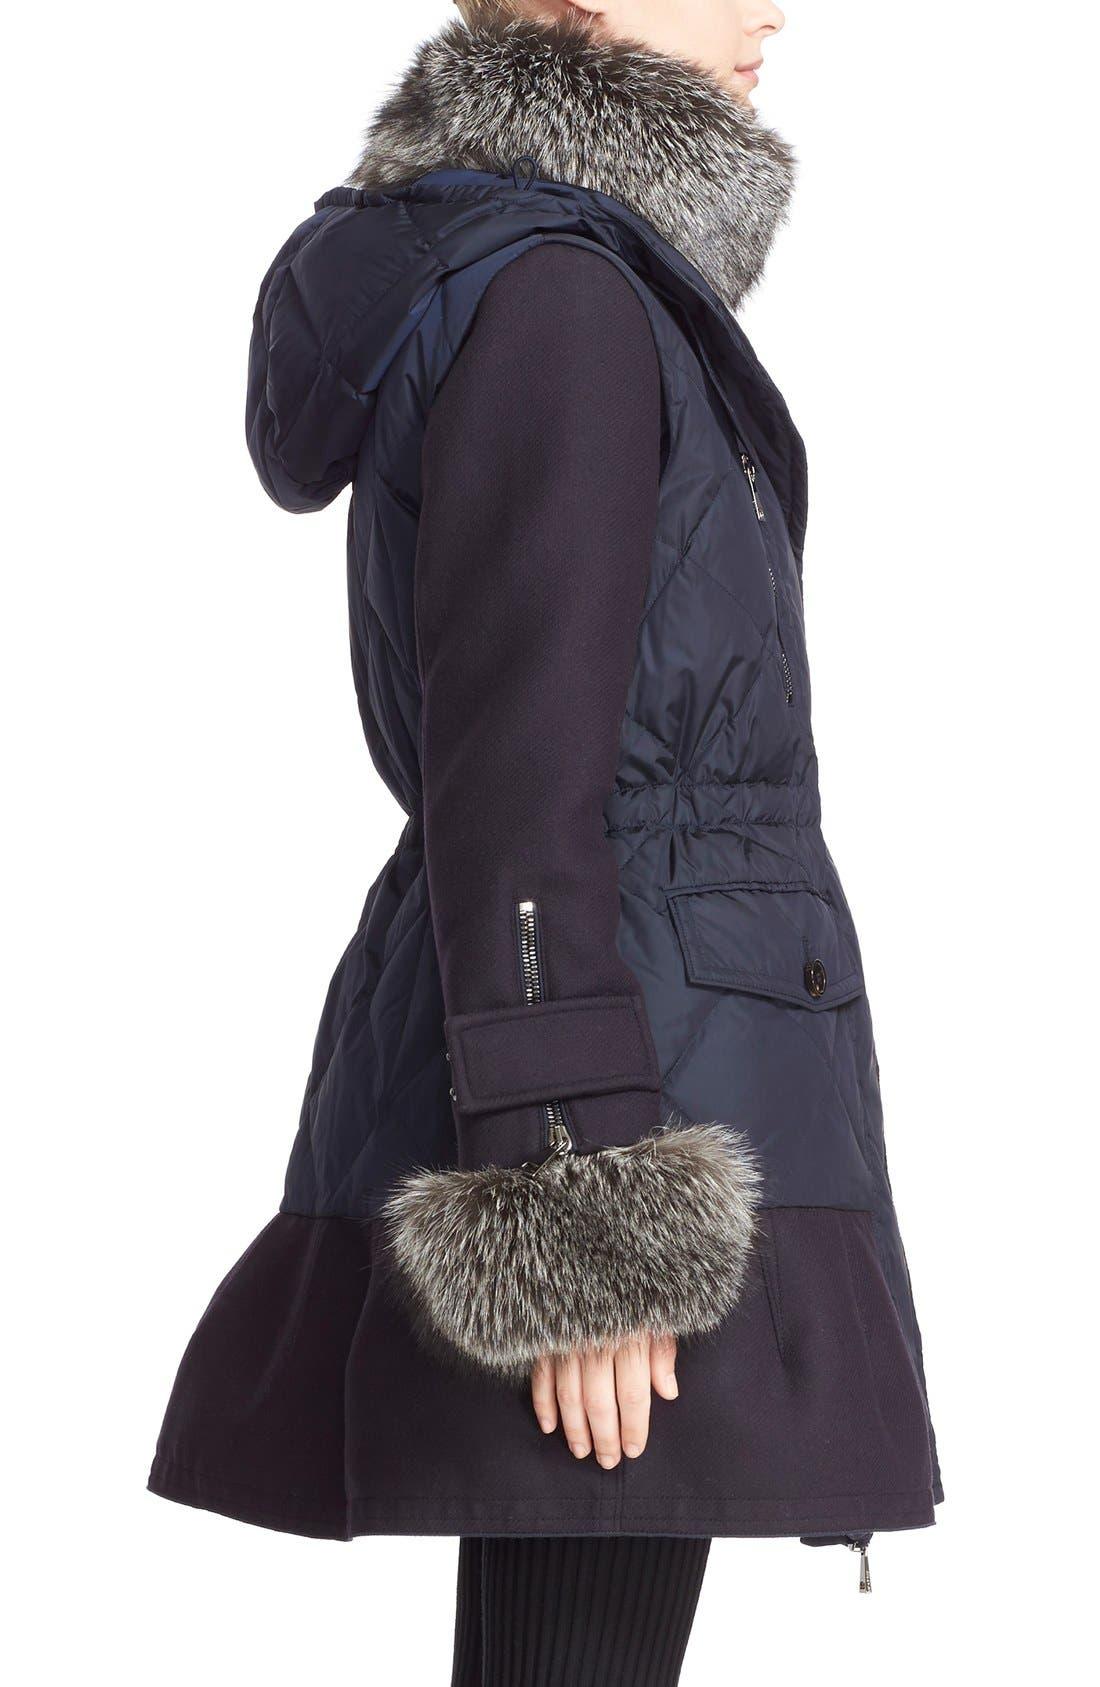 'Elestoria' Two-Piece Down Puffer Coat with Genuine Fox Fur Trim,                             Alternate thumbnail 12, color,                             419